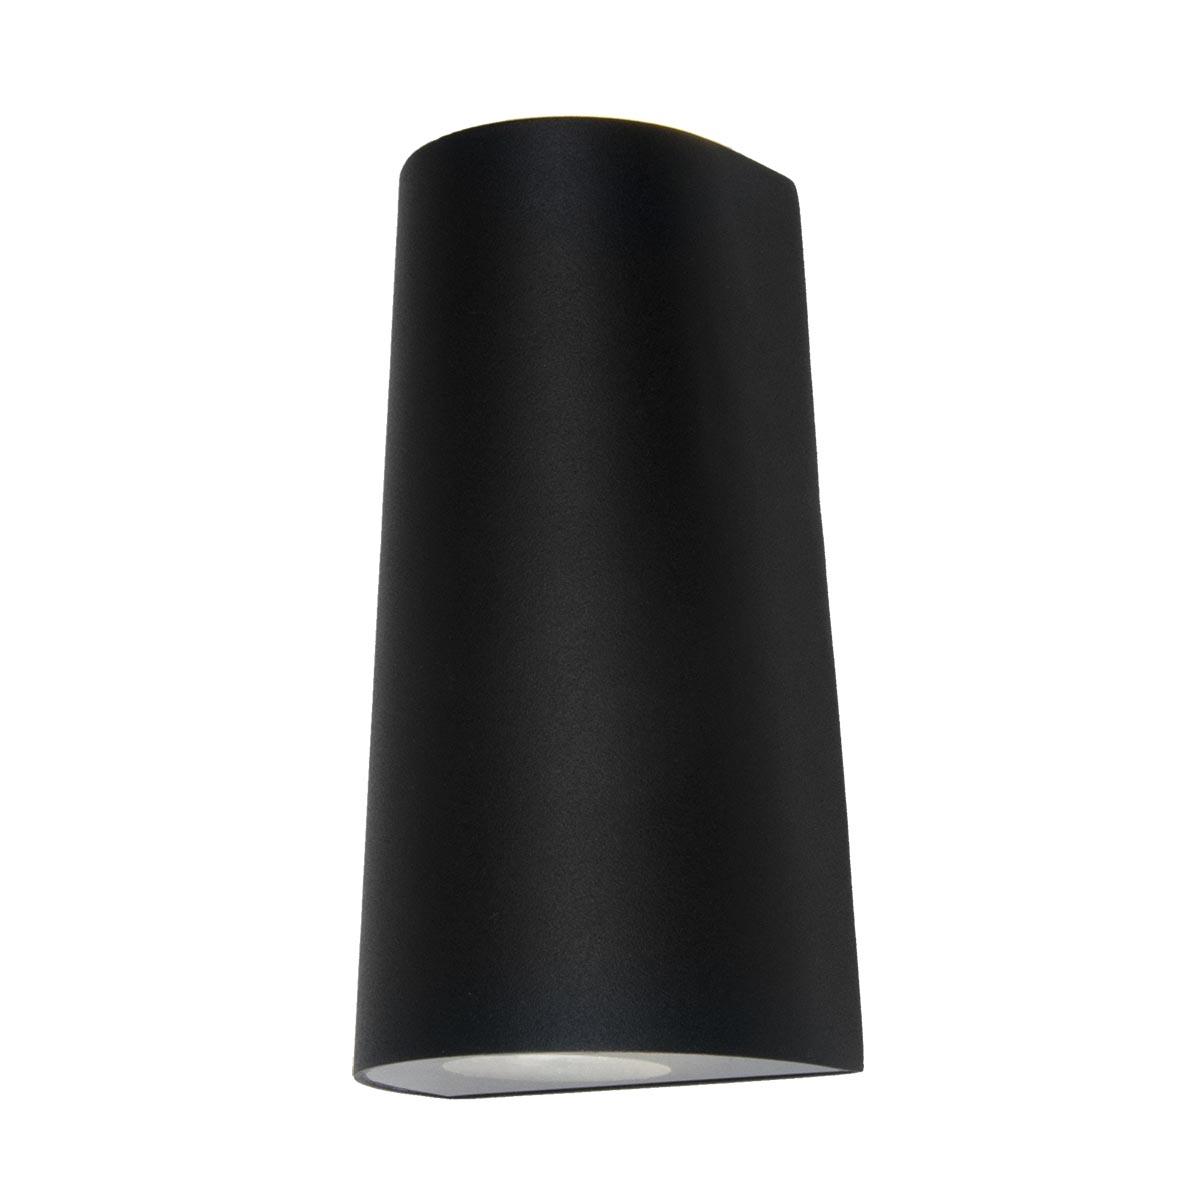 Светильник Elektrostandard 4690389150135 Glow